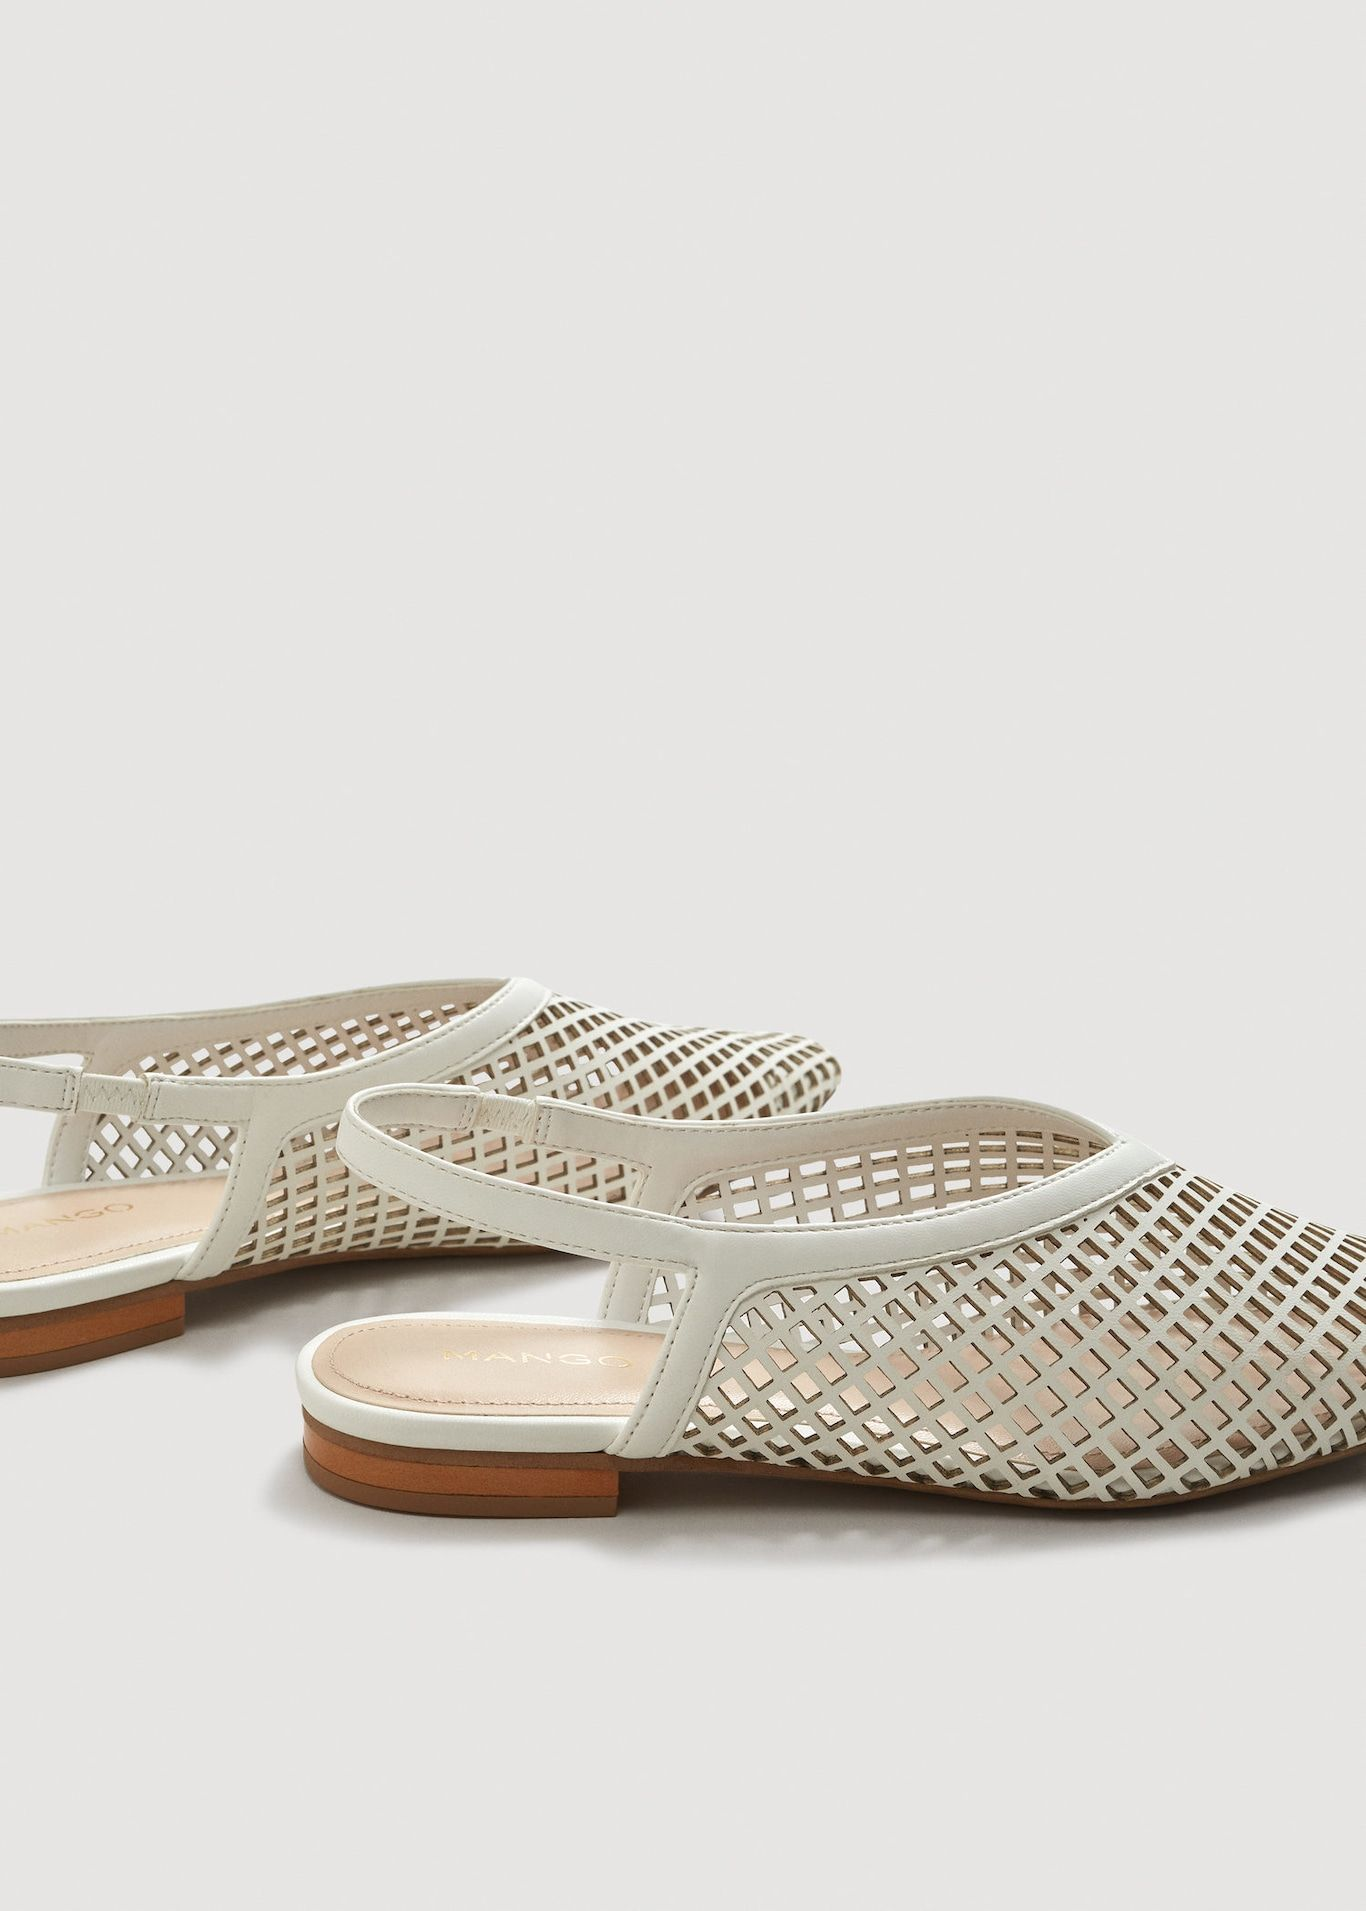 66e4204b038fd Laser-cut slingback shoes - Women in 2019 | ○ s h o e s ...